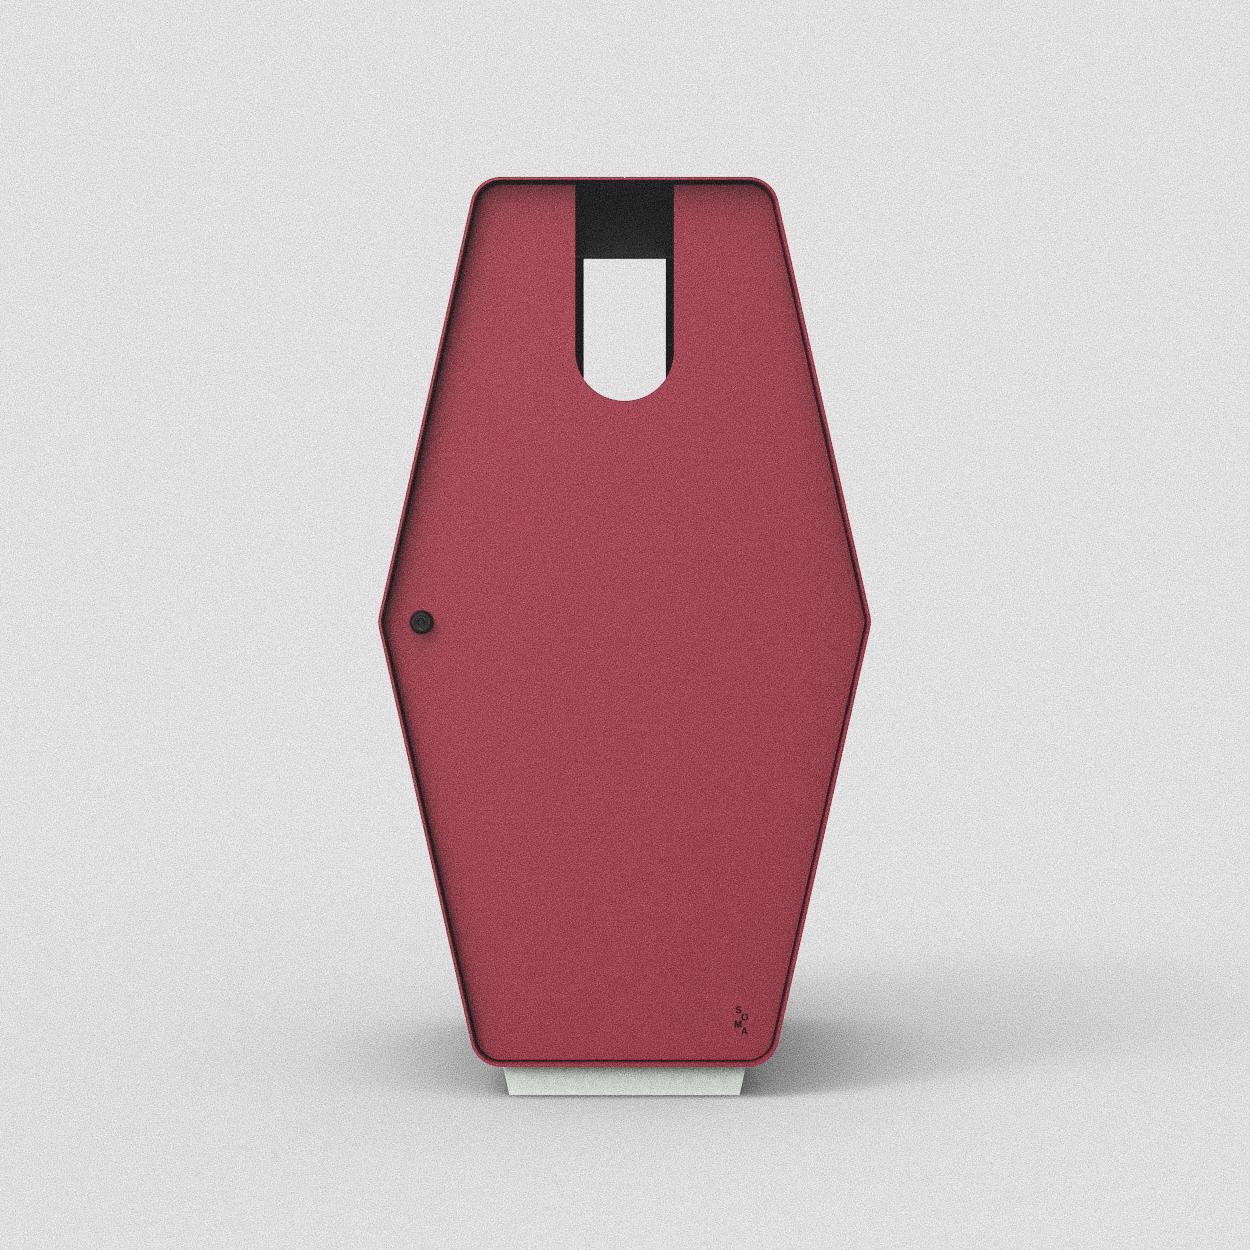 Inkast: Papper / Standardfärg: Lingon